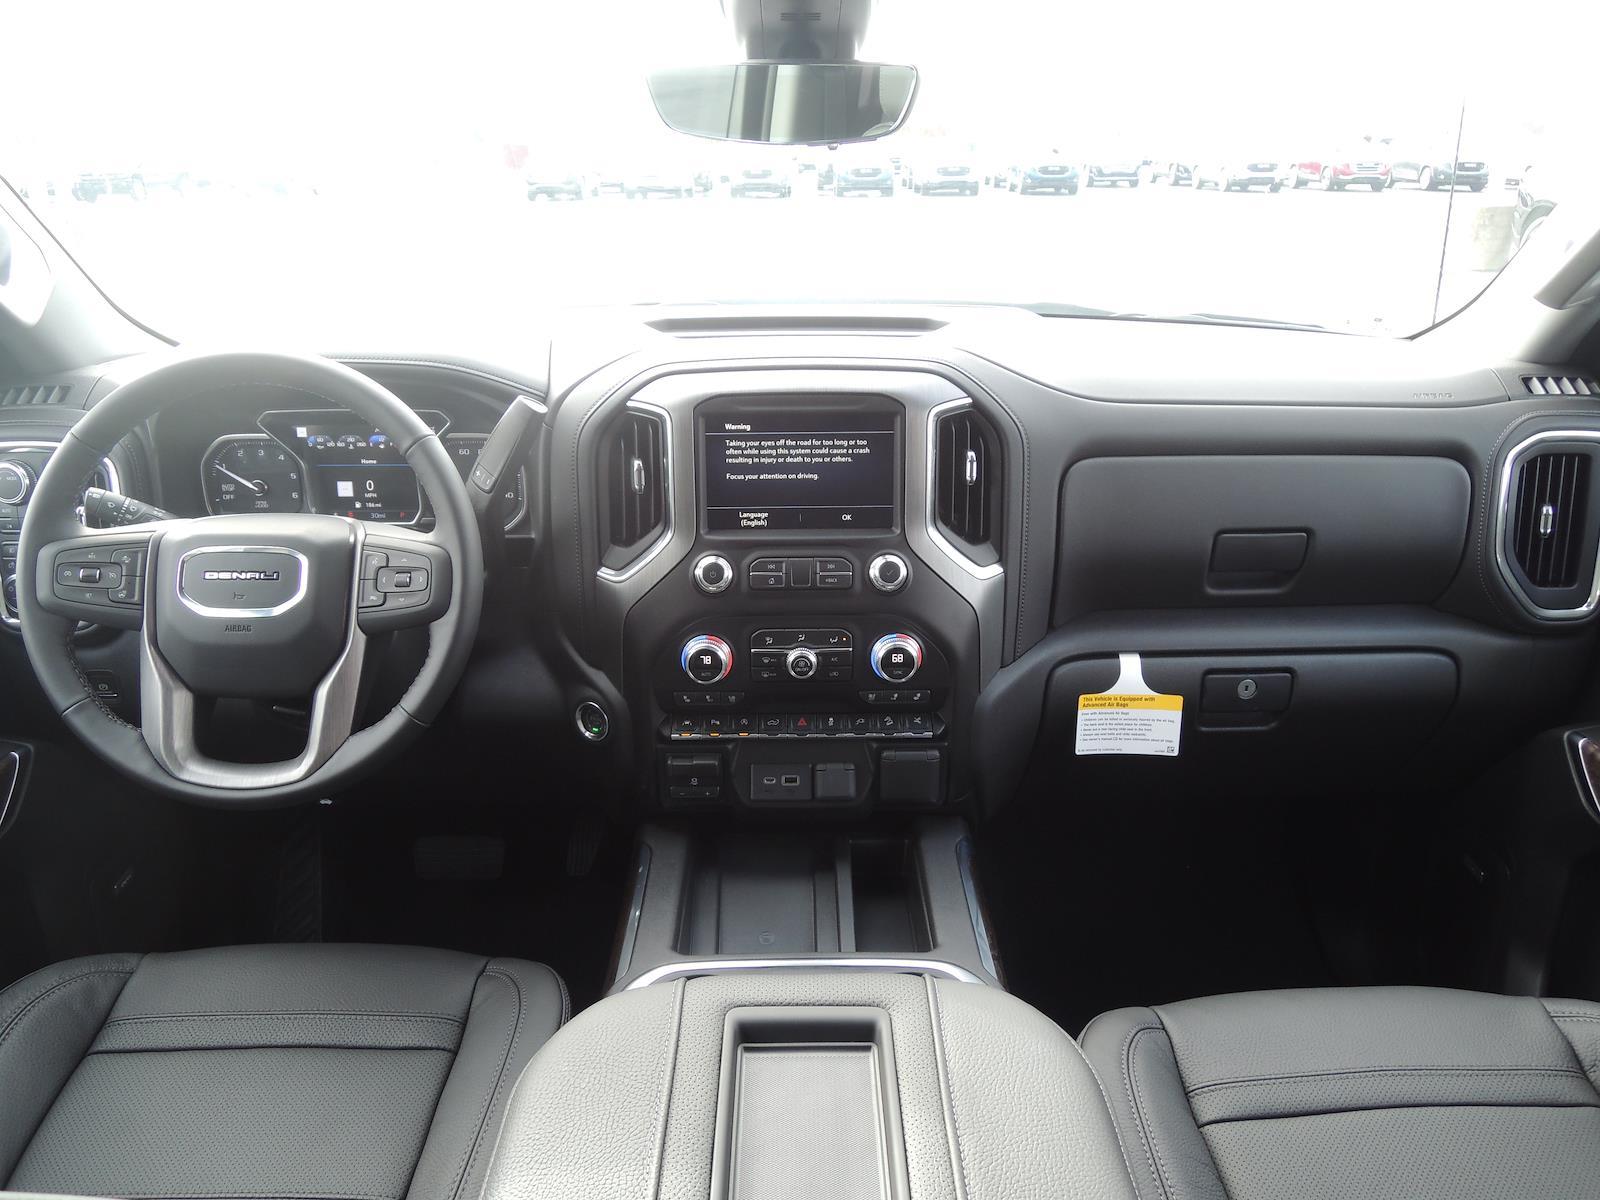 2021 GMC Sierra 1500 Crew Cab 4x4, Pickup #MT434 - photo 14